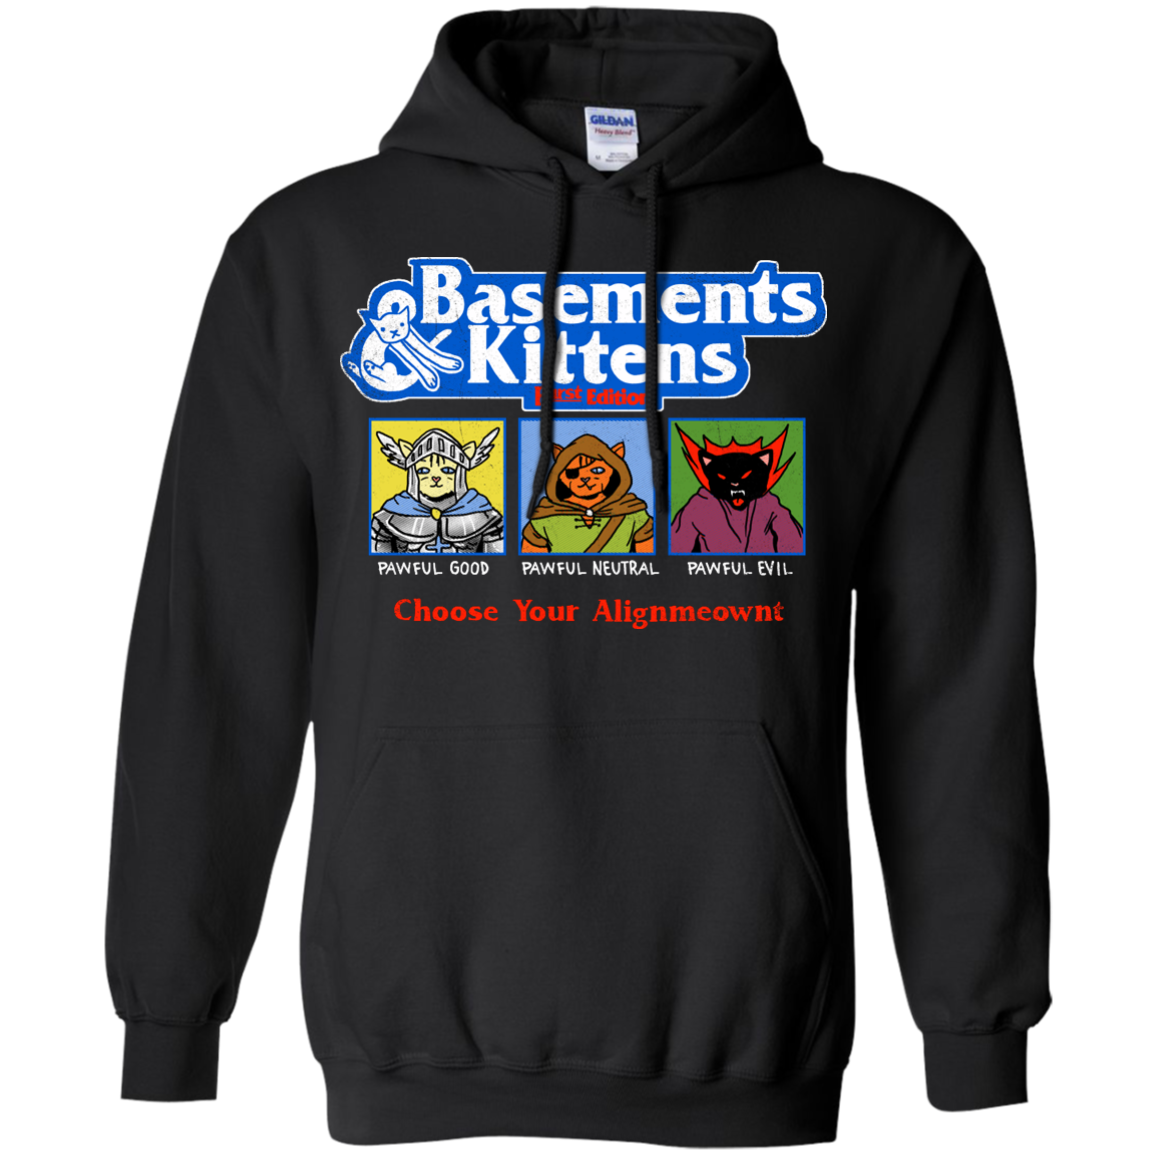 Basets Kittens Shirts